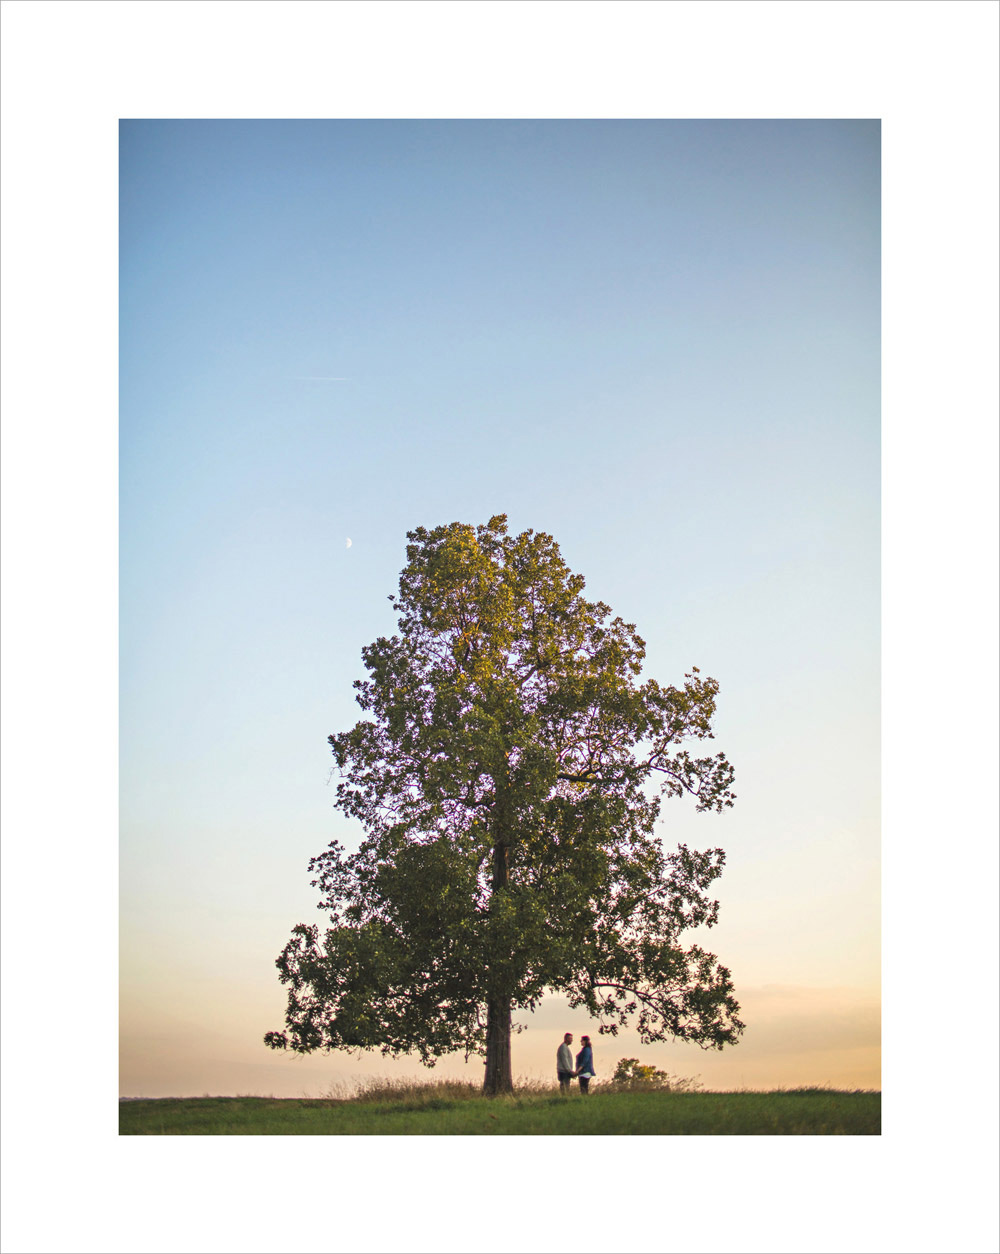 Eric-Yerke-Photography-2013-122.jpg